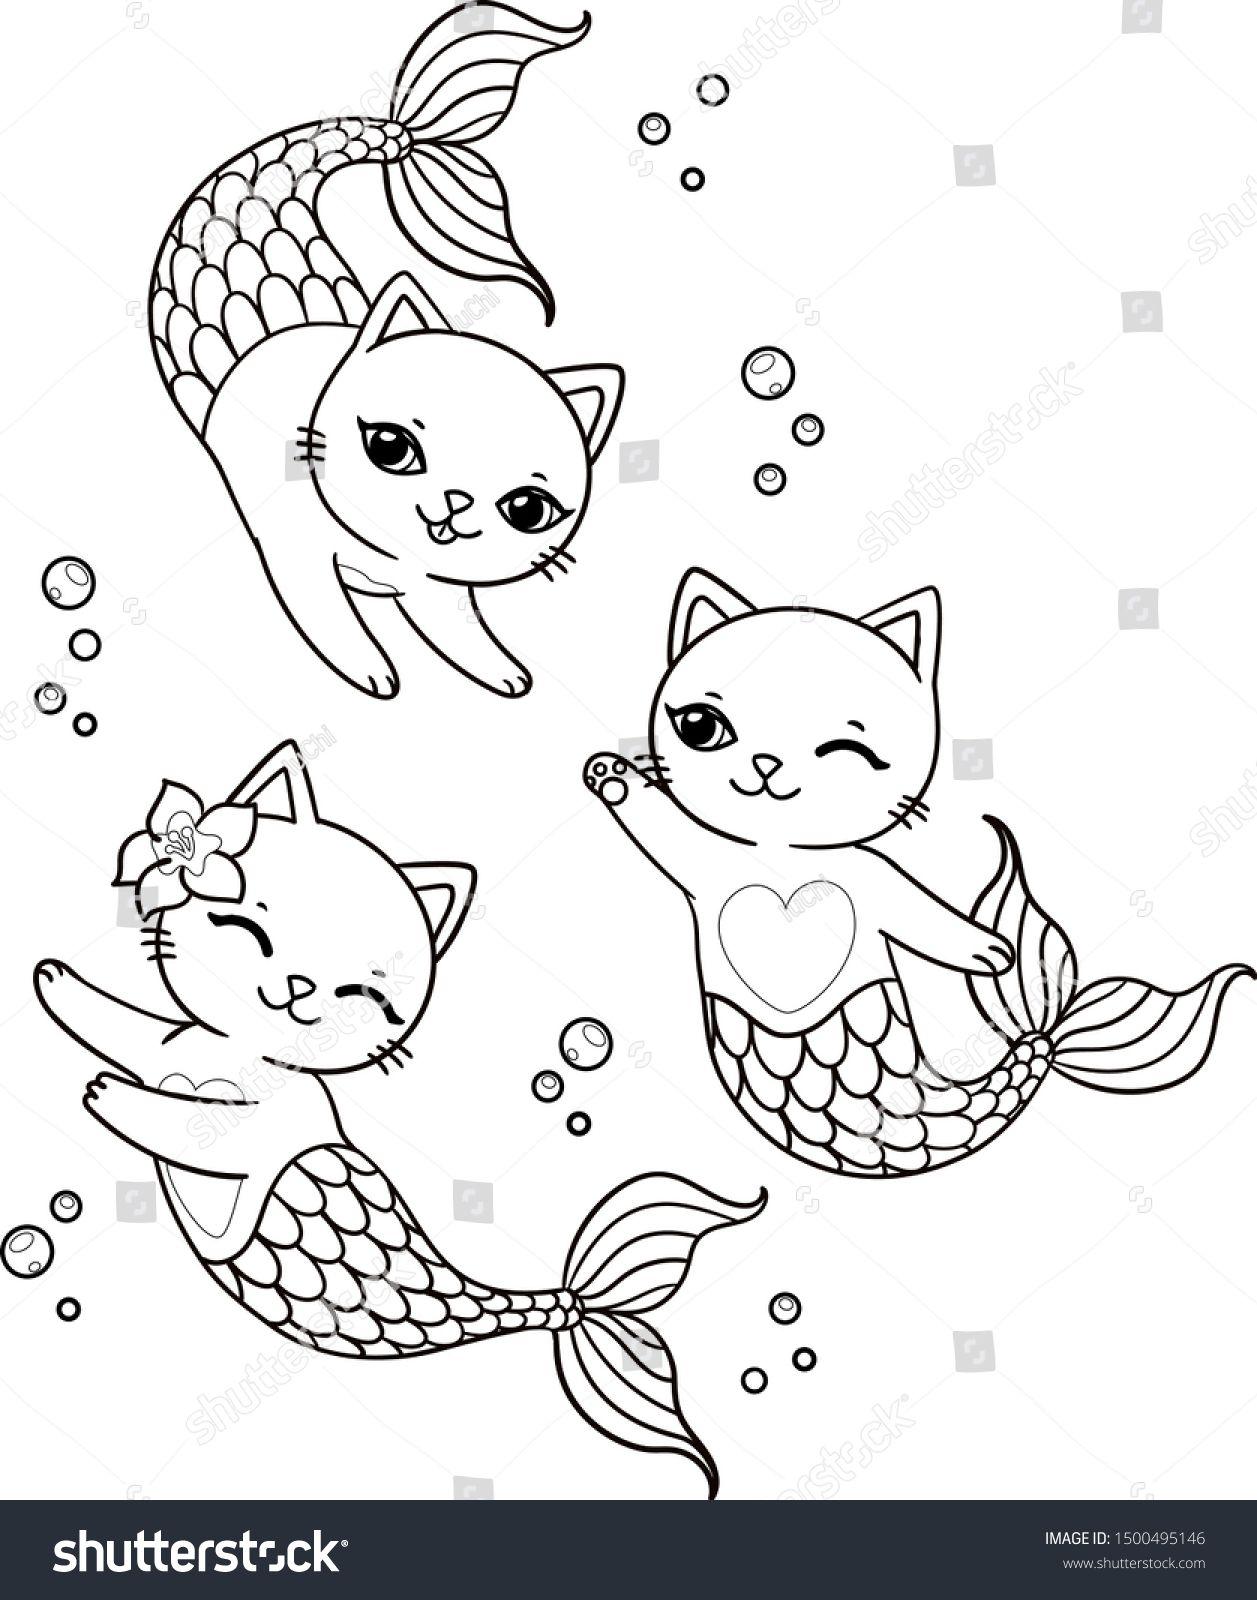 Three Cute Mermaid Cats Bubbles Vector Stock Vector Royalty Free 1500495146 Mermaid Coloring Book Unicorn Coloring Pages Mermaid Coloring Pages